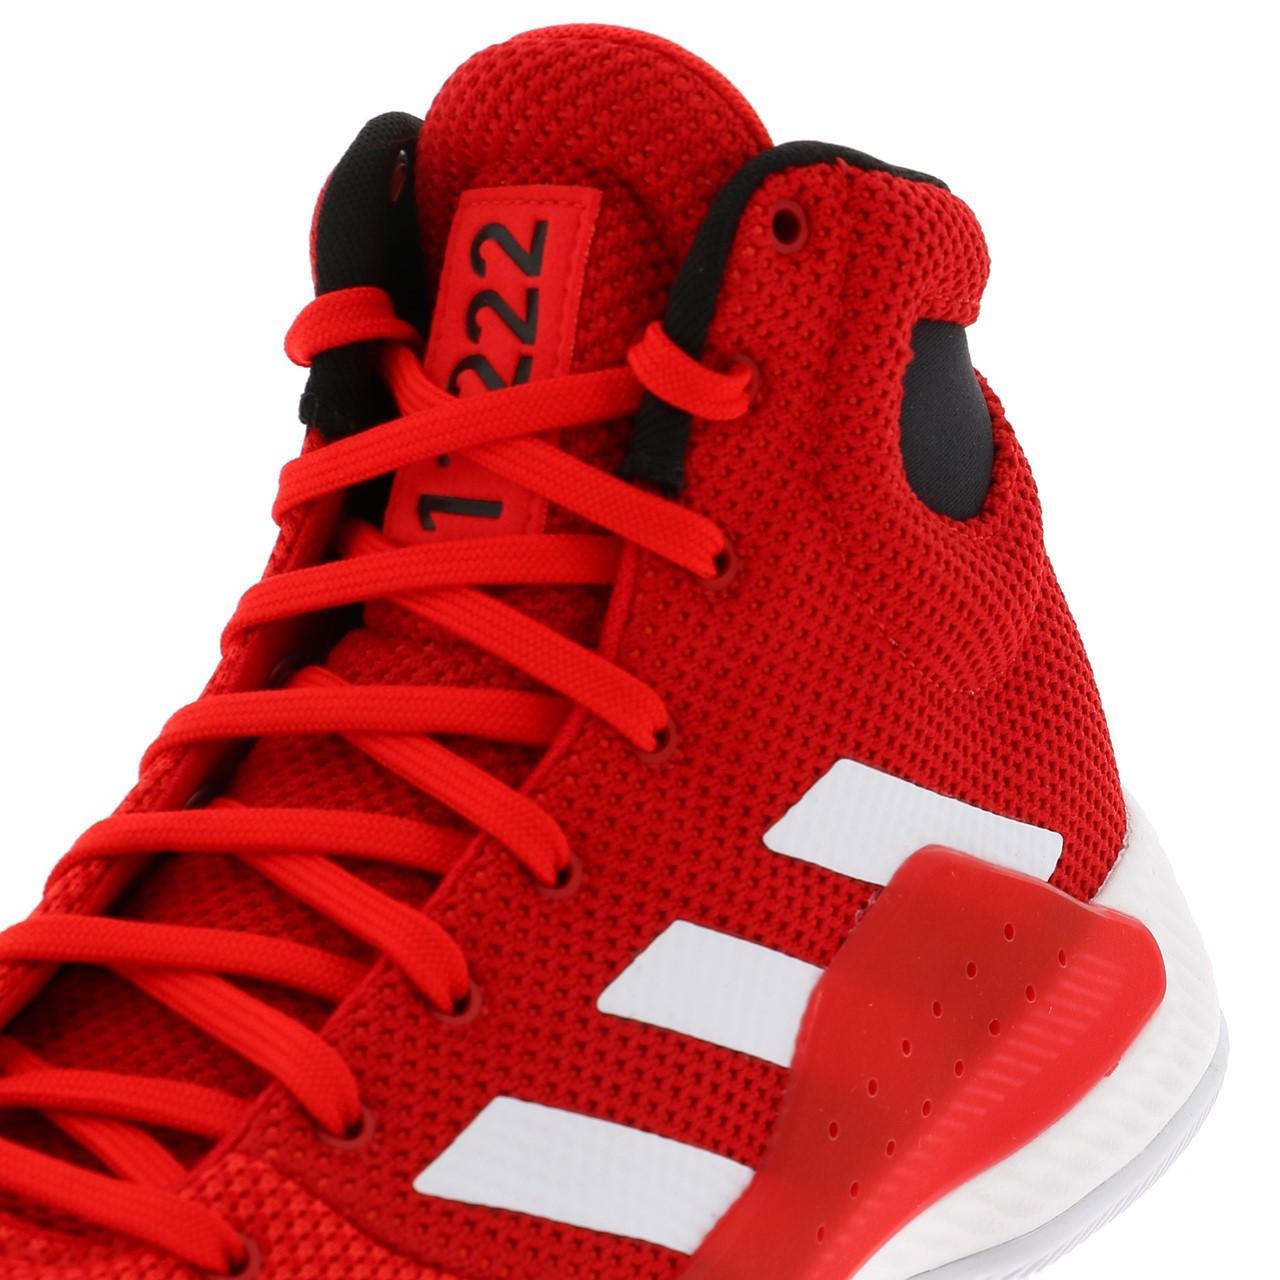 Chaussures-basket-Adidas-Pro-bounce-madness-basket-Rouge-55000-Neuf miniature 2